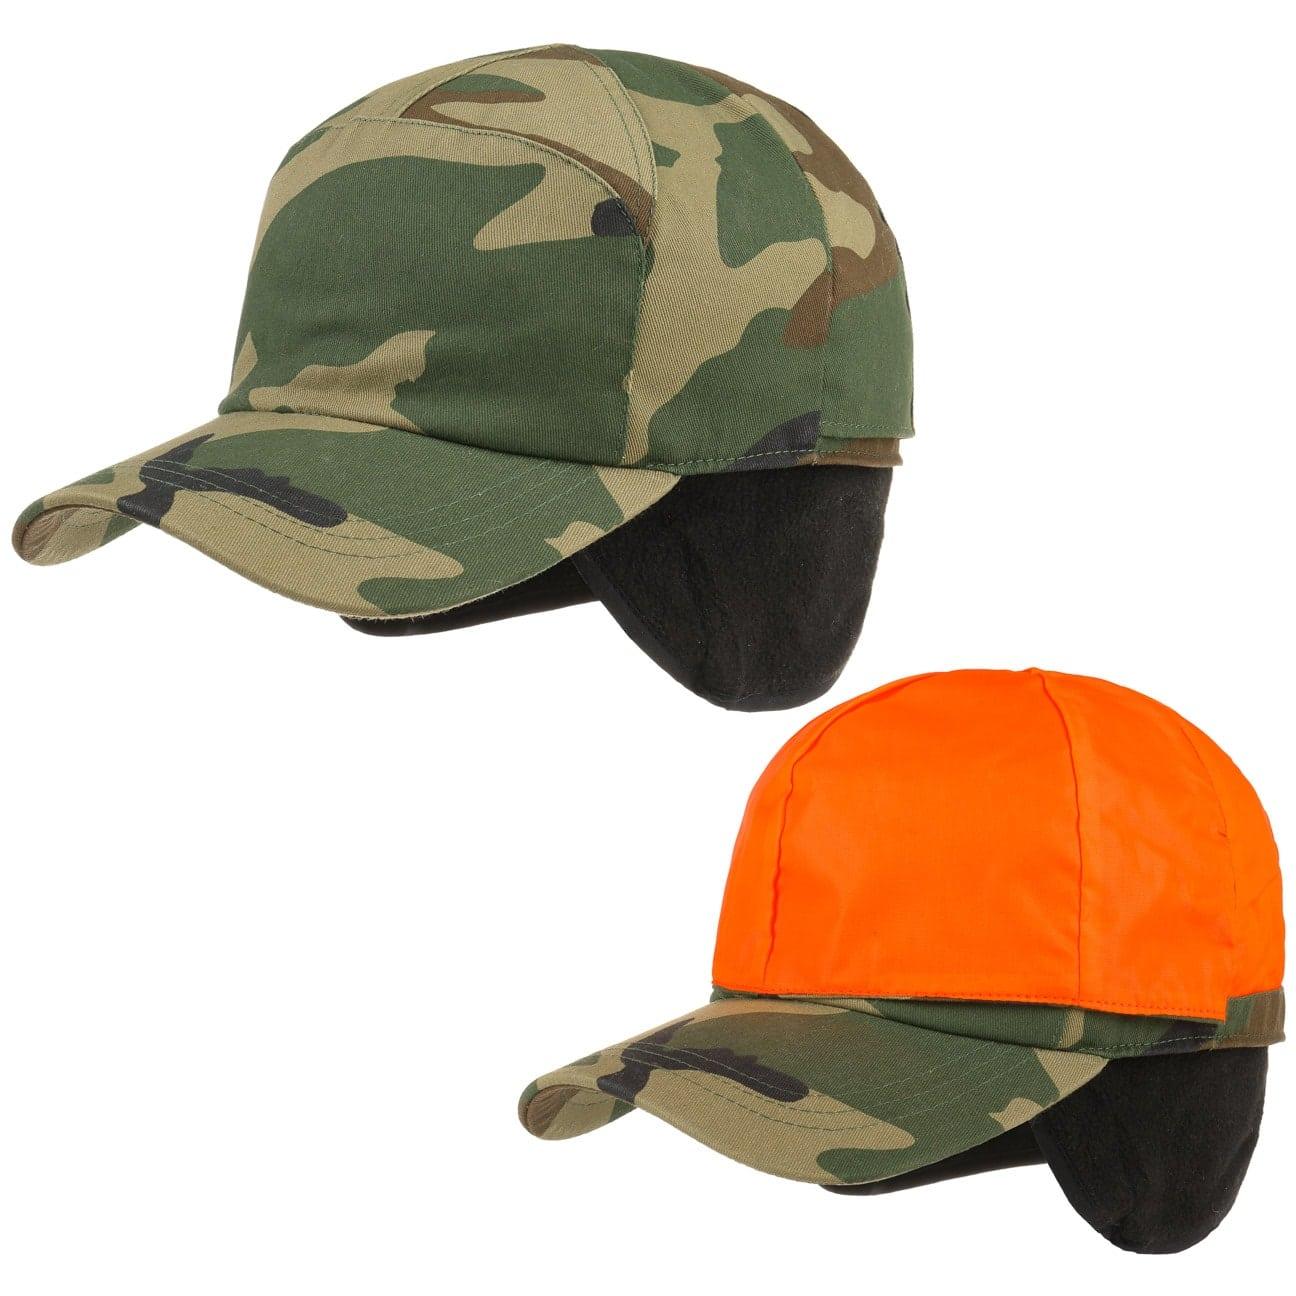 signal-cap-mit-futter-und-ohrenklappen-by-lipodo-jagdcap